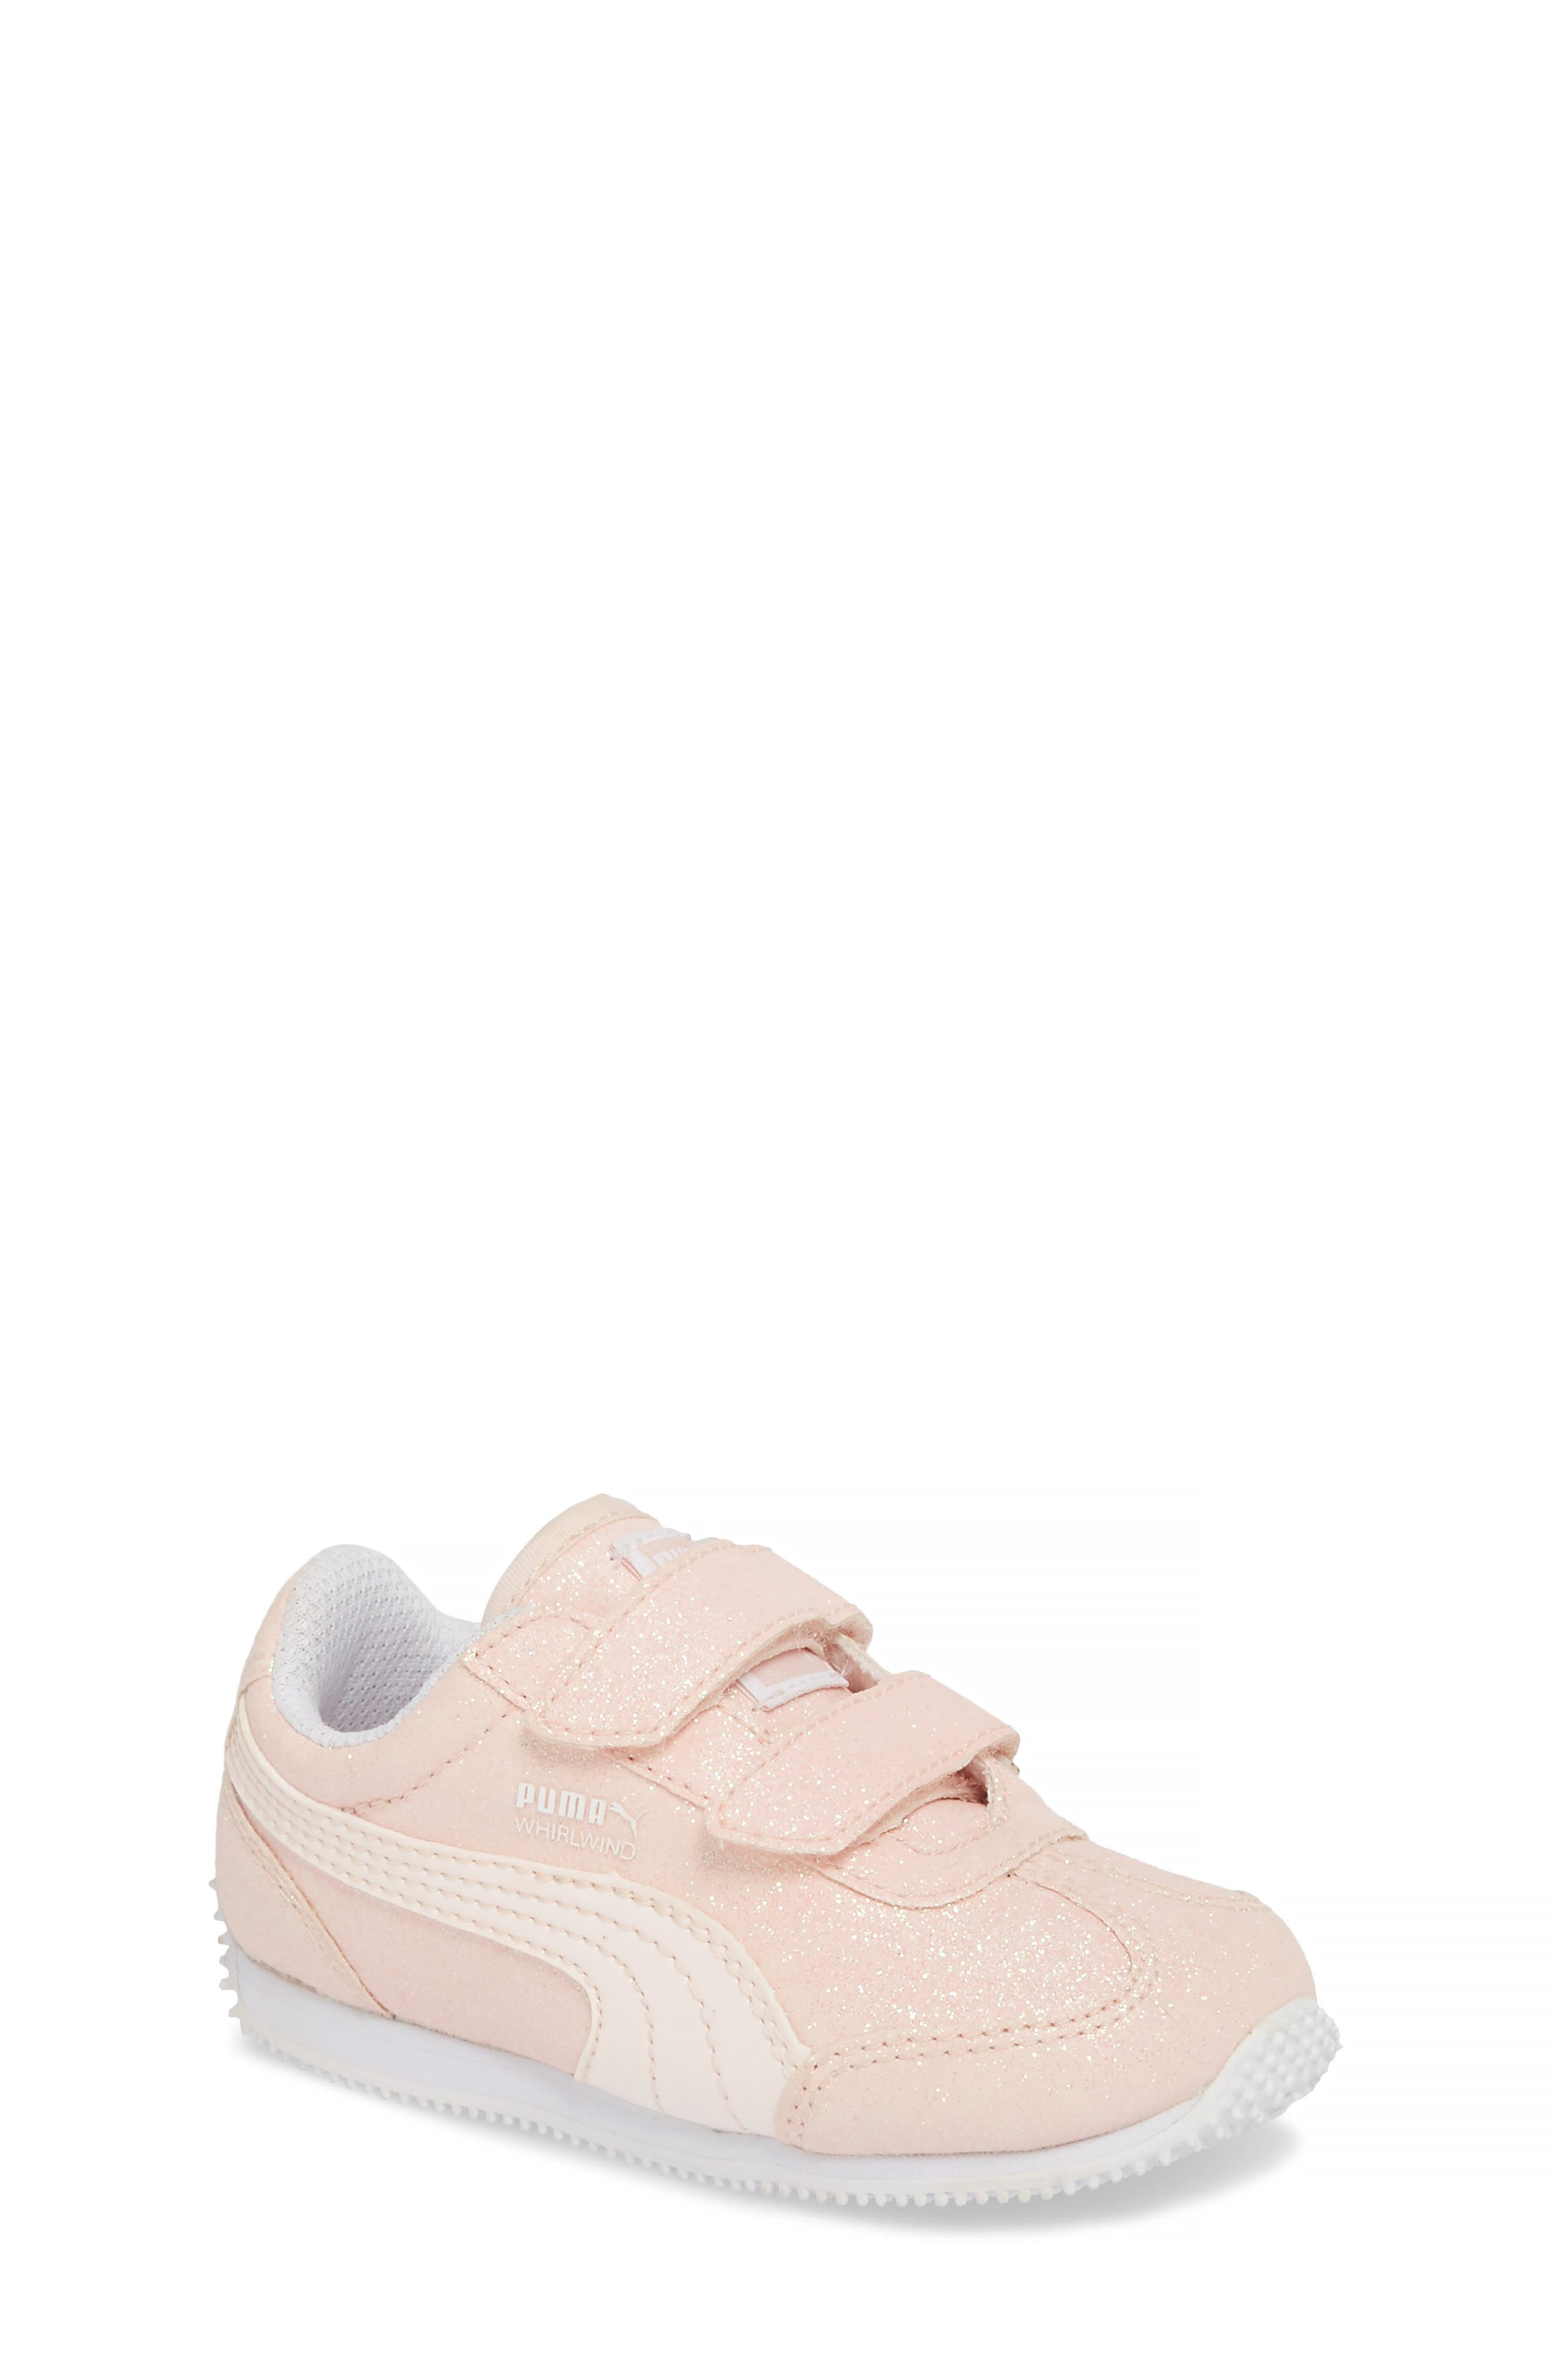 Whirlwind Glitz Sneaker,                             Main thumbnail 1, color,                             Pearl/ Puma White